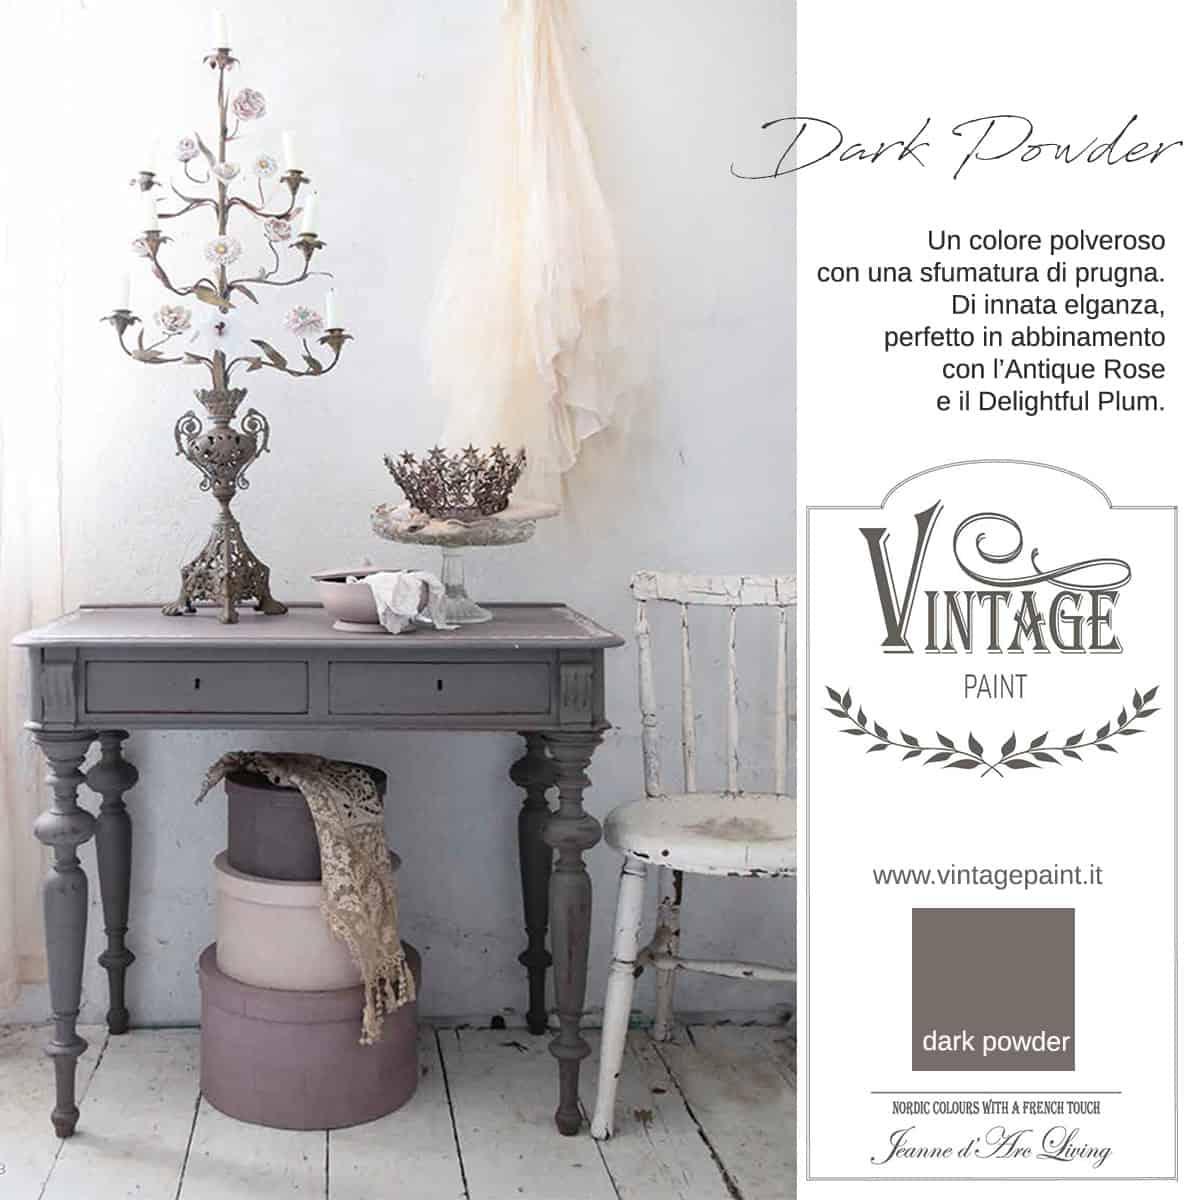 dark powder prugna viola vintage chalk paint vernici shabby chic autentico look gesso